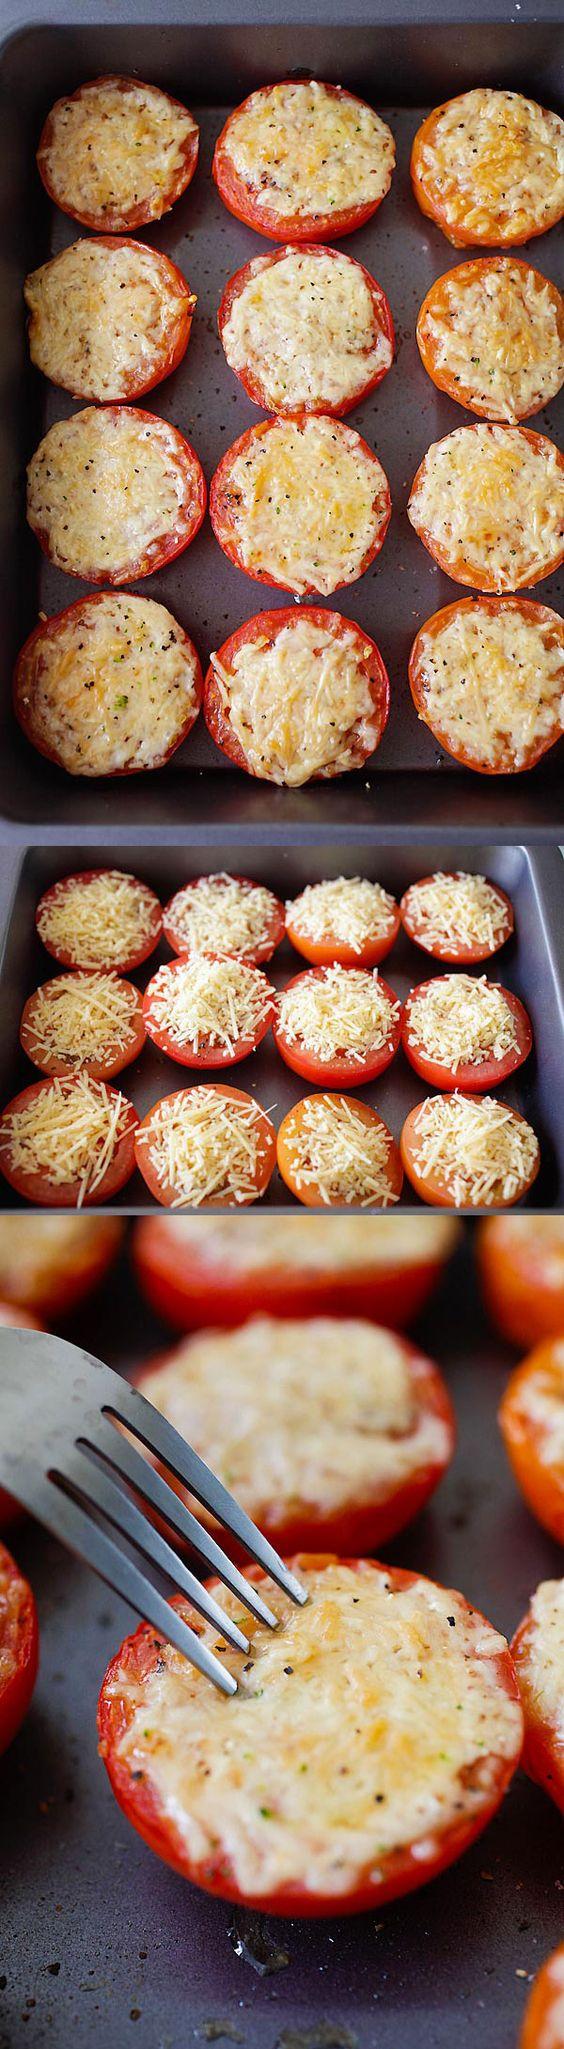 Parmesan Roasted Tomatoes - juicy and plump roasted tomatoes loaded with Parmesan cheese. So easy to make, fool-proof and amazing! | rasamalaysia.com